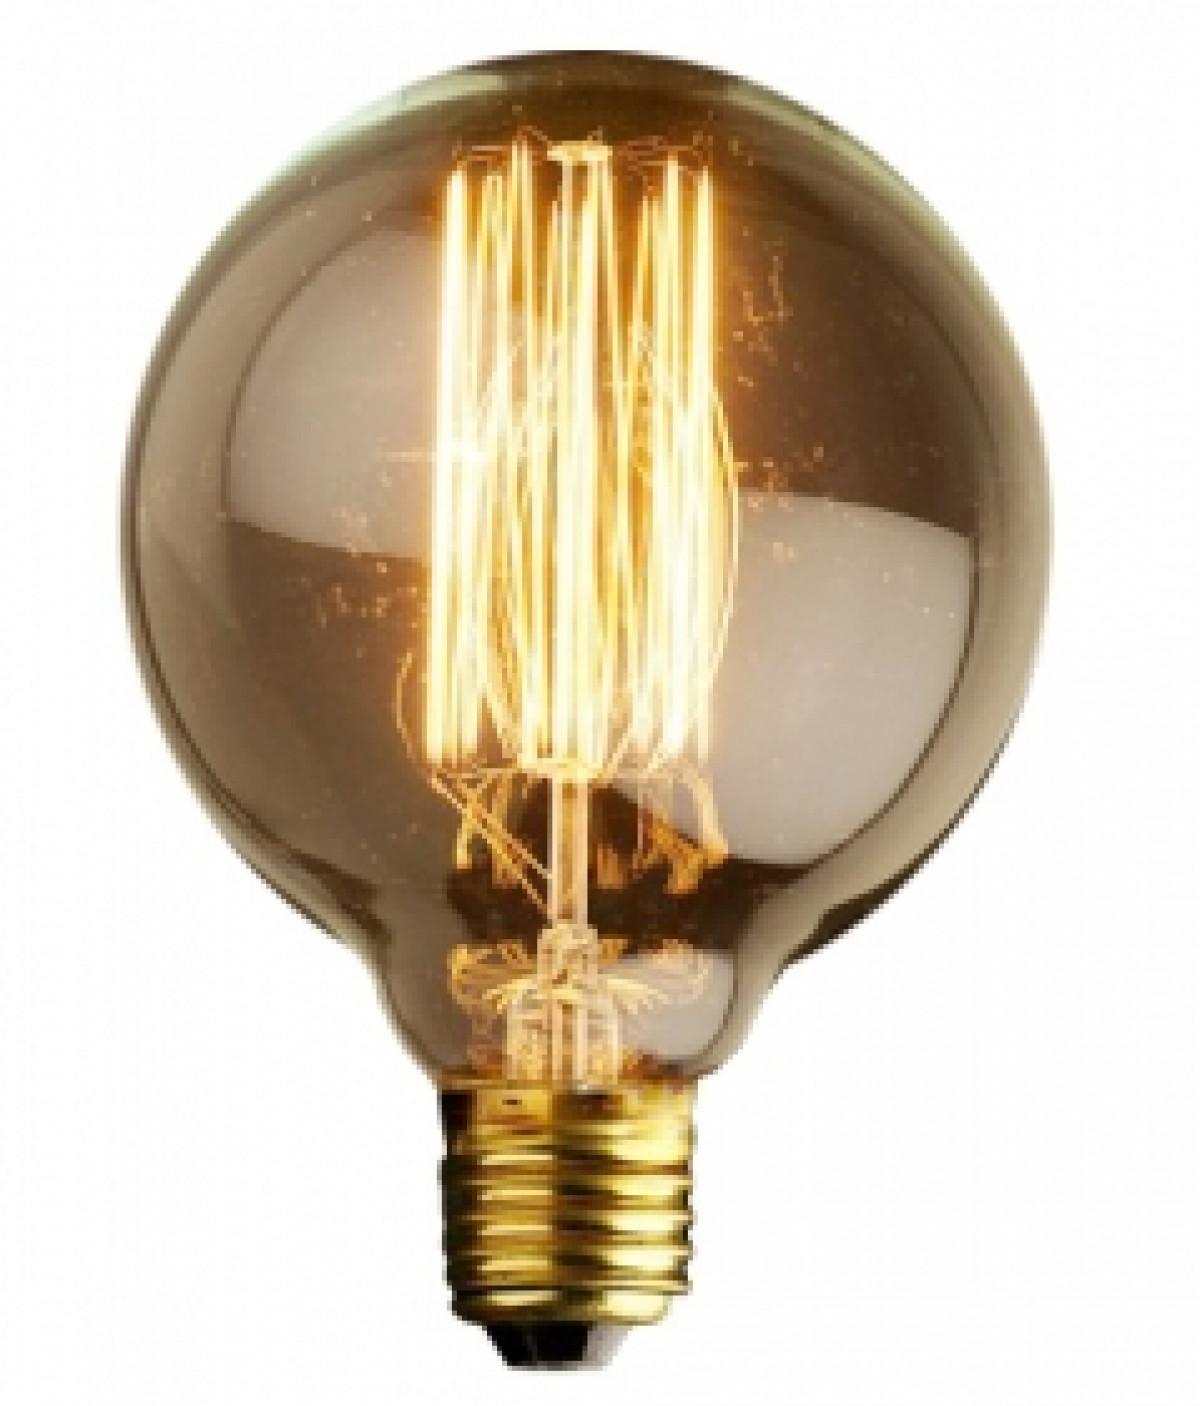 L mpada de filamento de carbono globo 40w 220v dimlux for Lampada globo